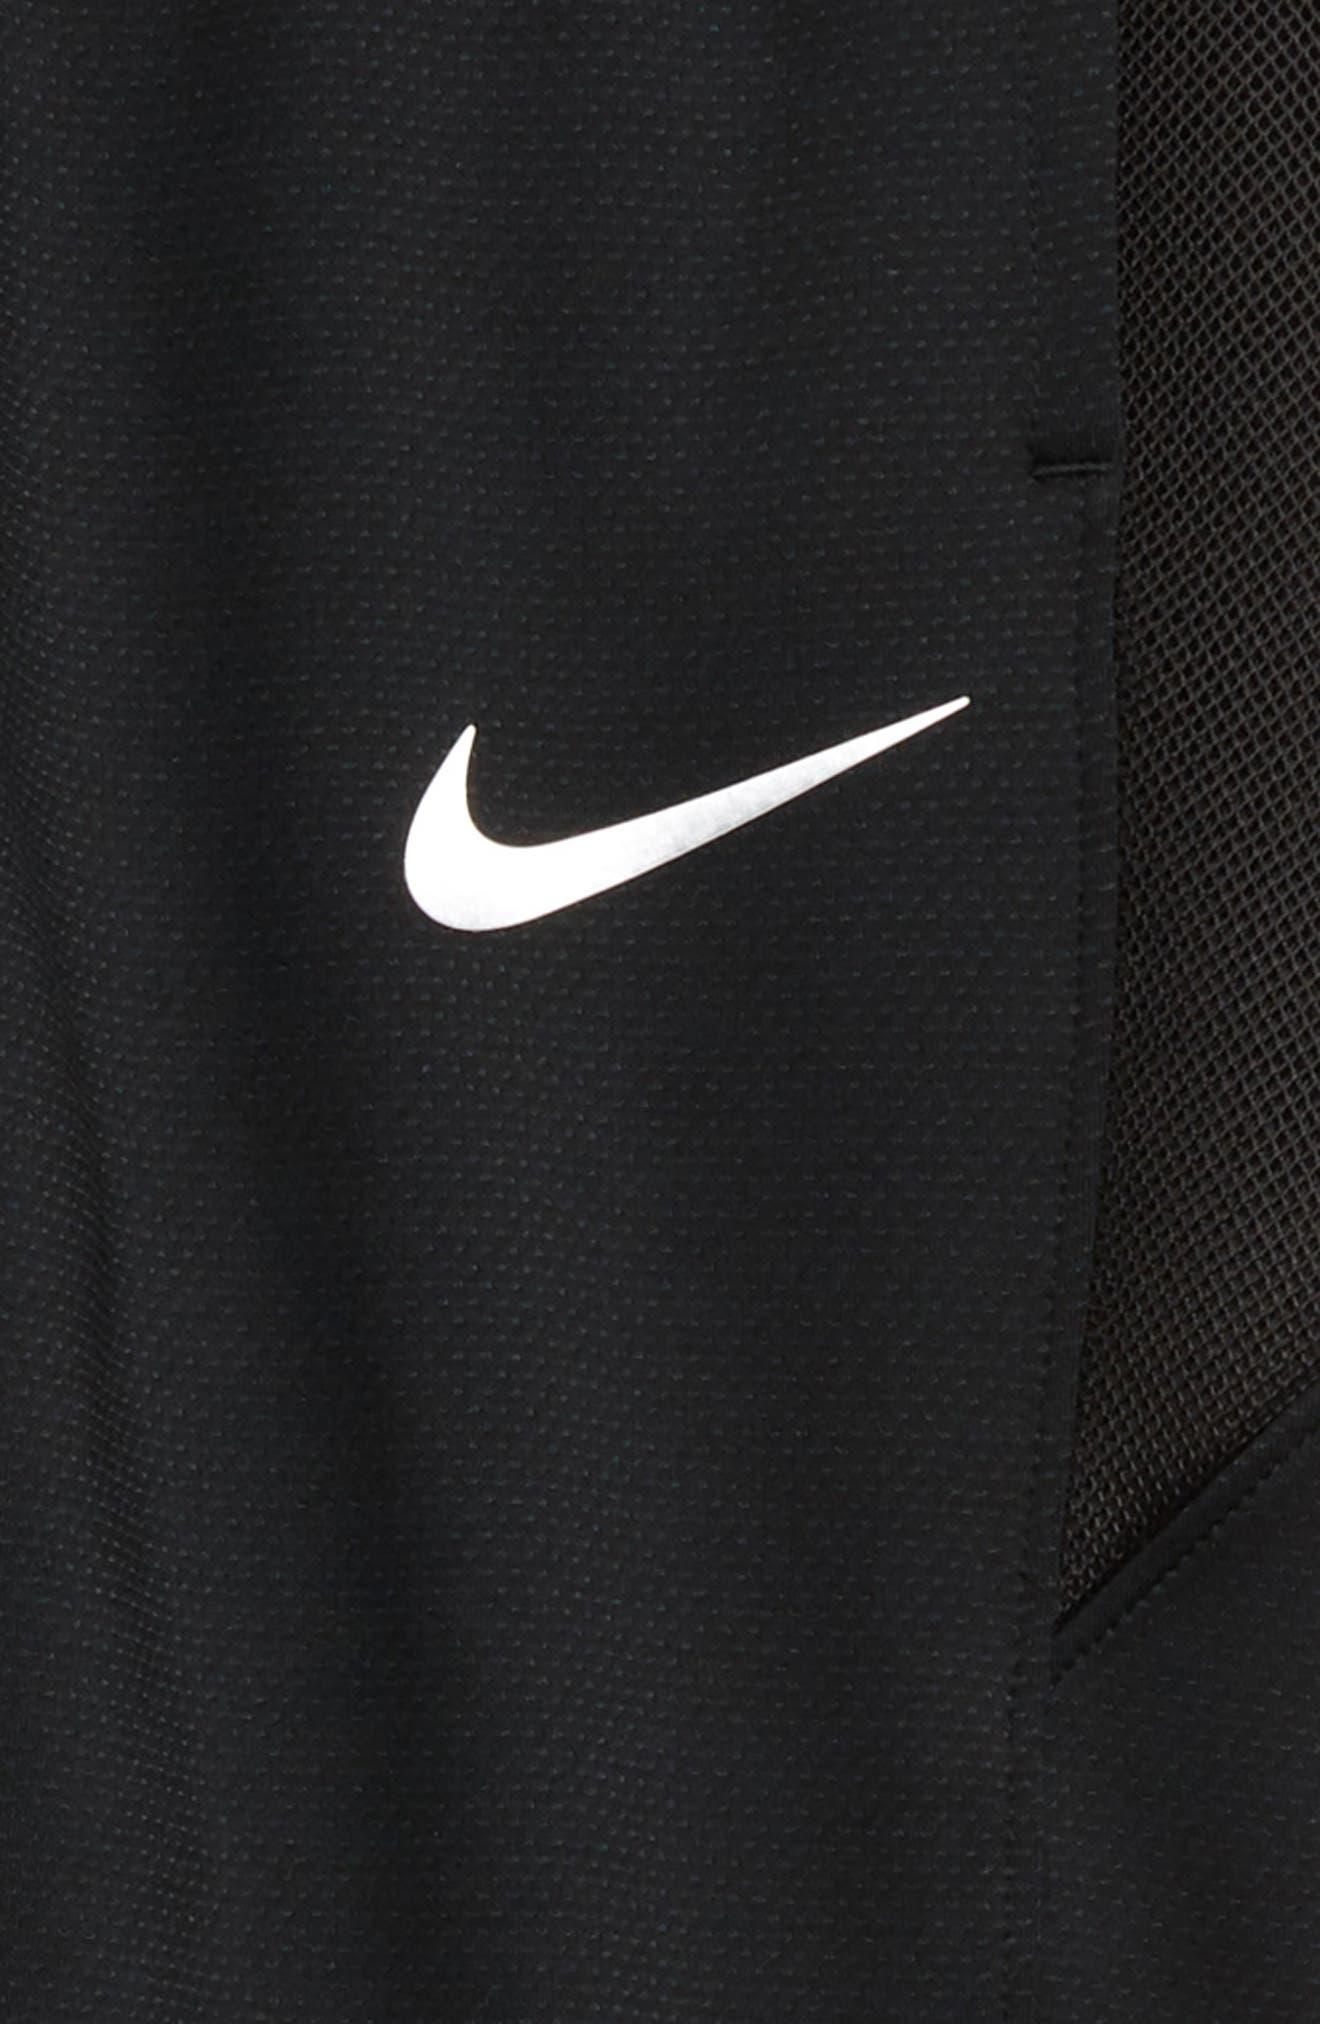 Dry Therma Flex Showtime Basketball Pants,                             Alternate thumbnail 2, color,                             BLACK/ METALLIC SILVER